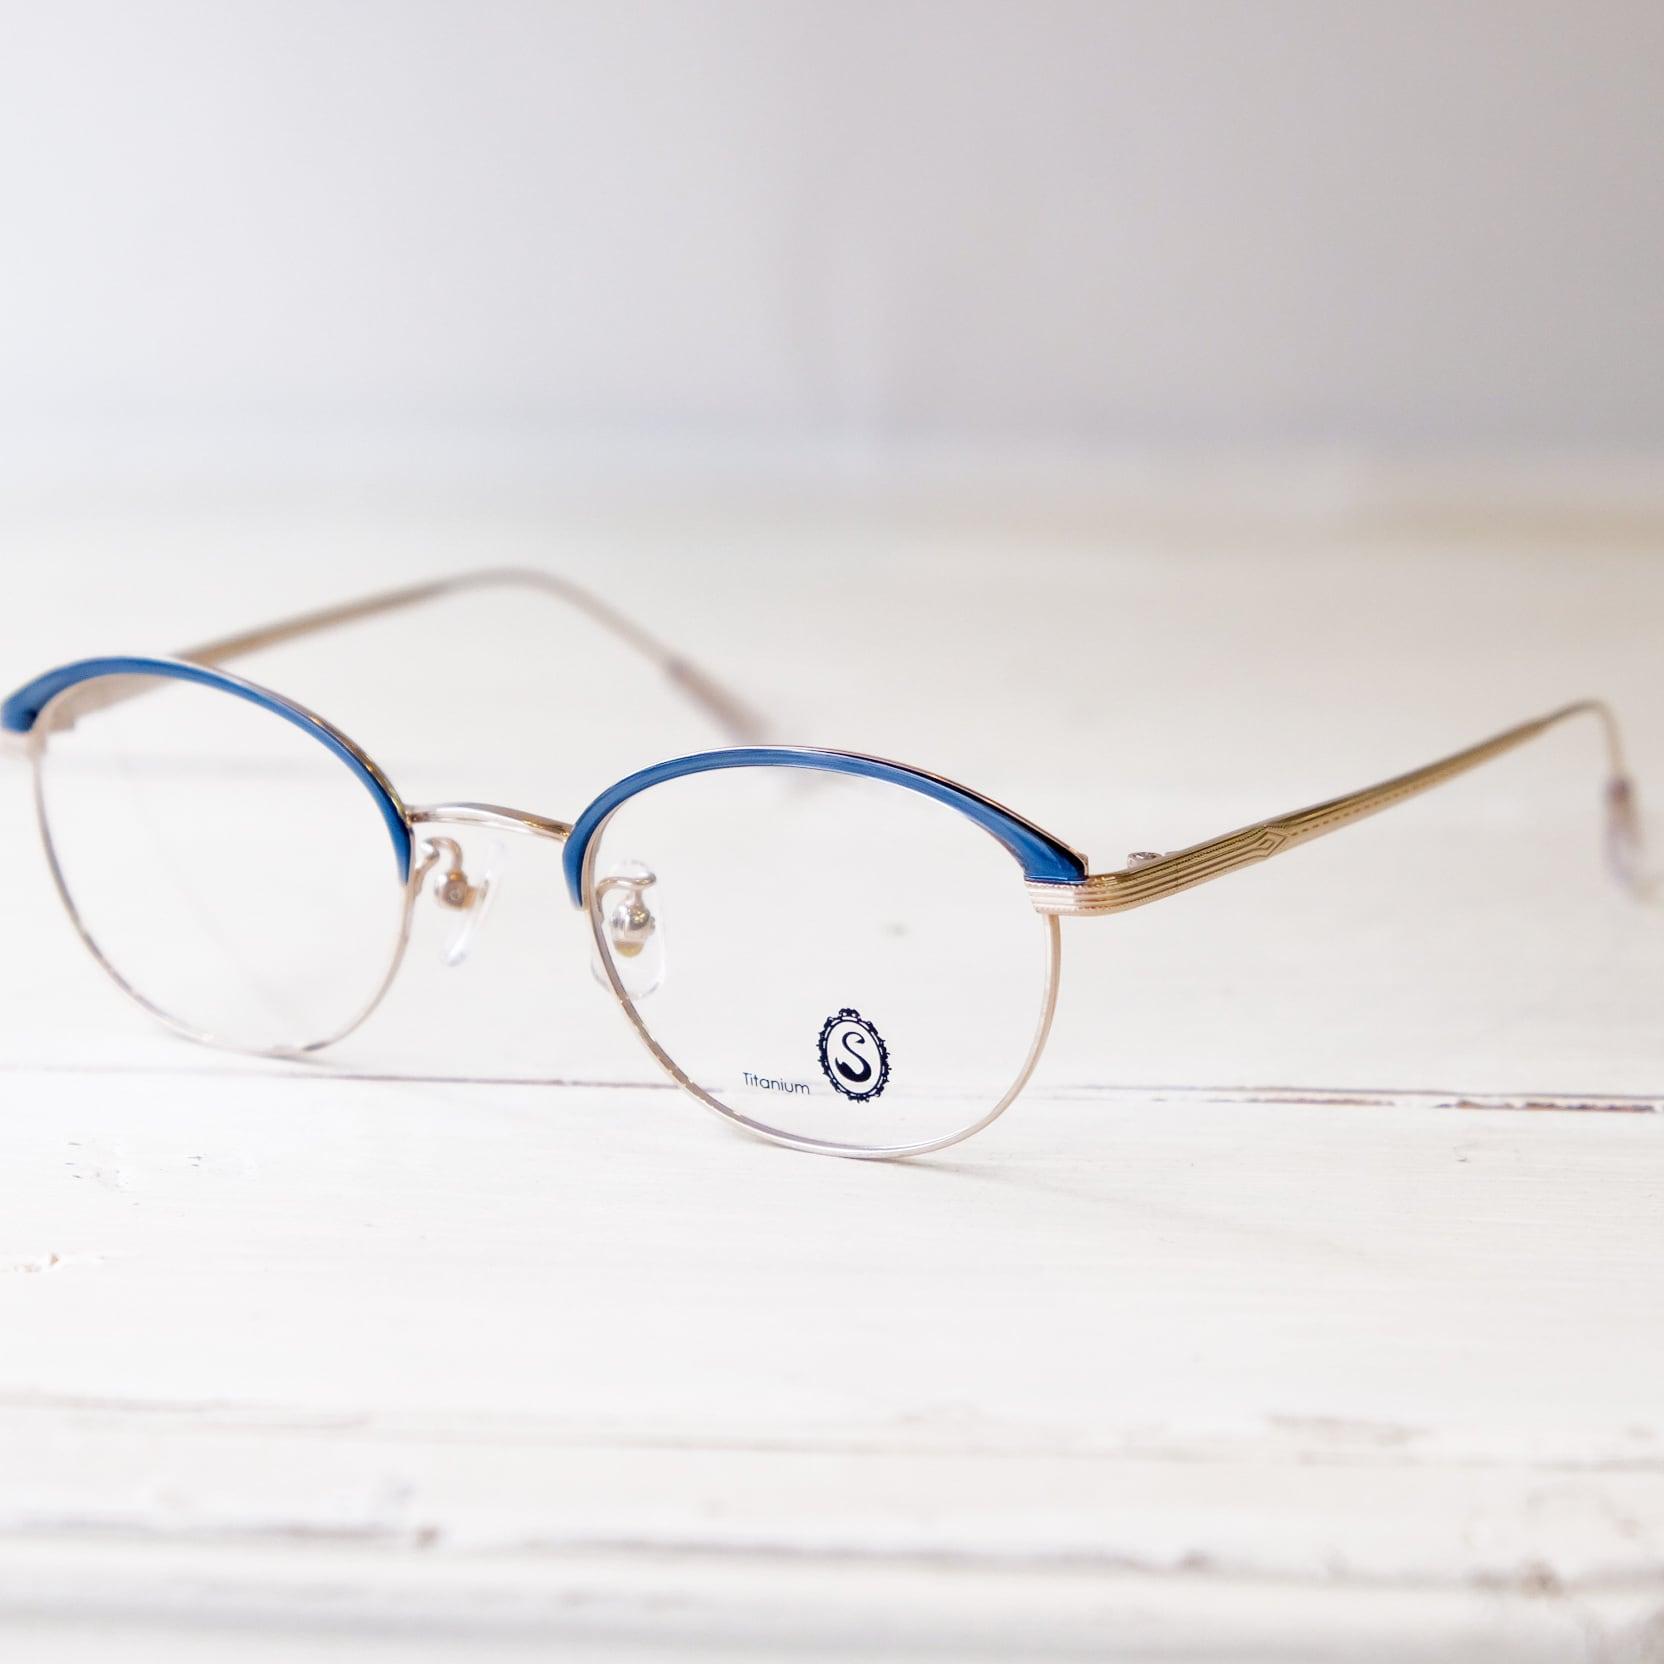 Seacret Remedy シークレットレメディ メガネ レディースブロウ S-040 / White gold +Smoke Blue